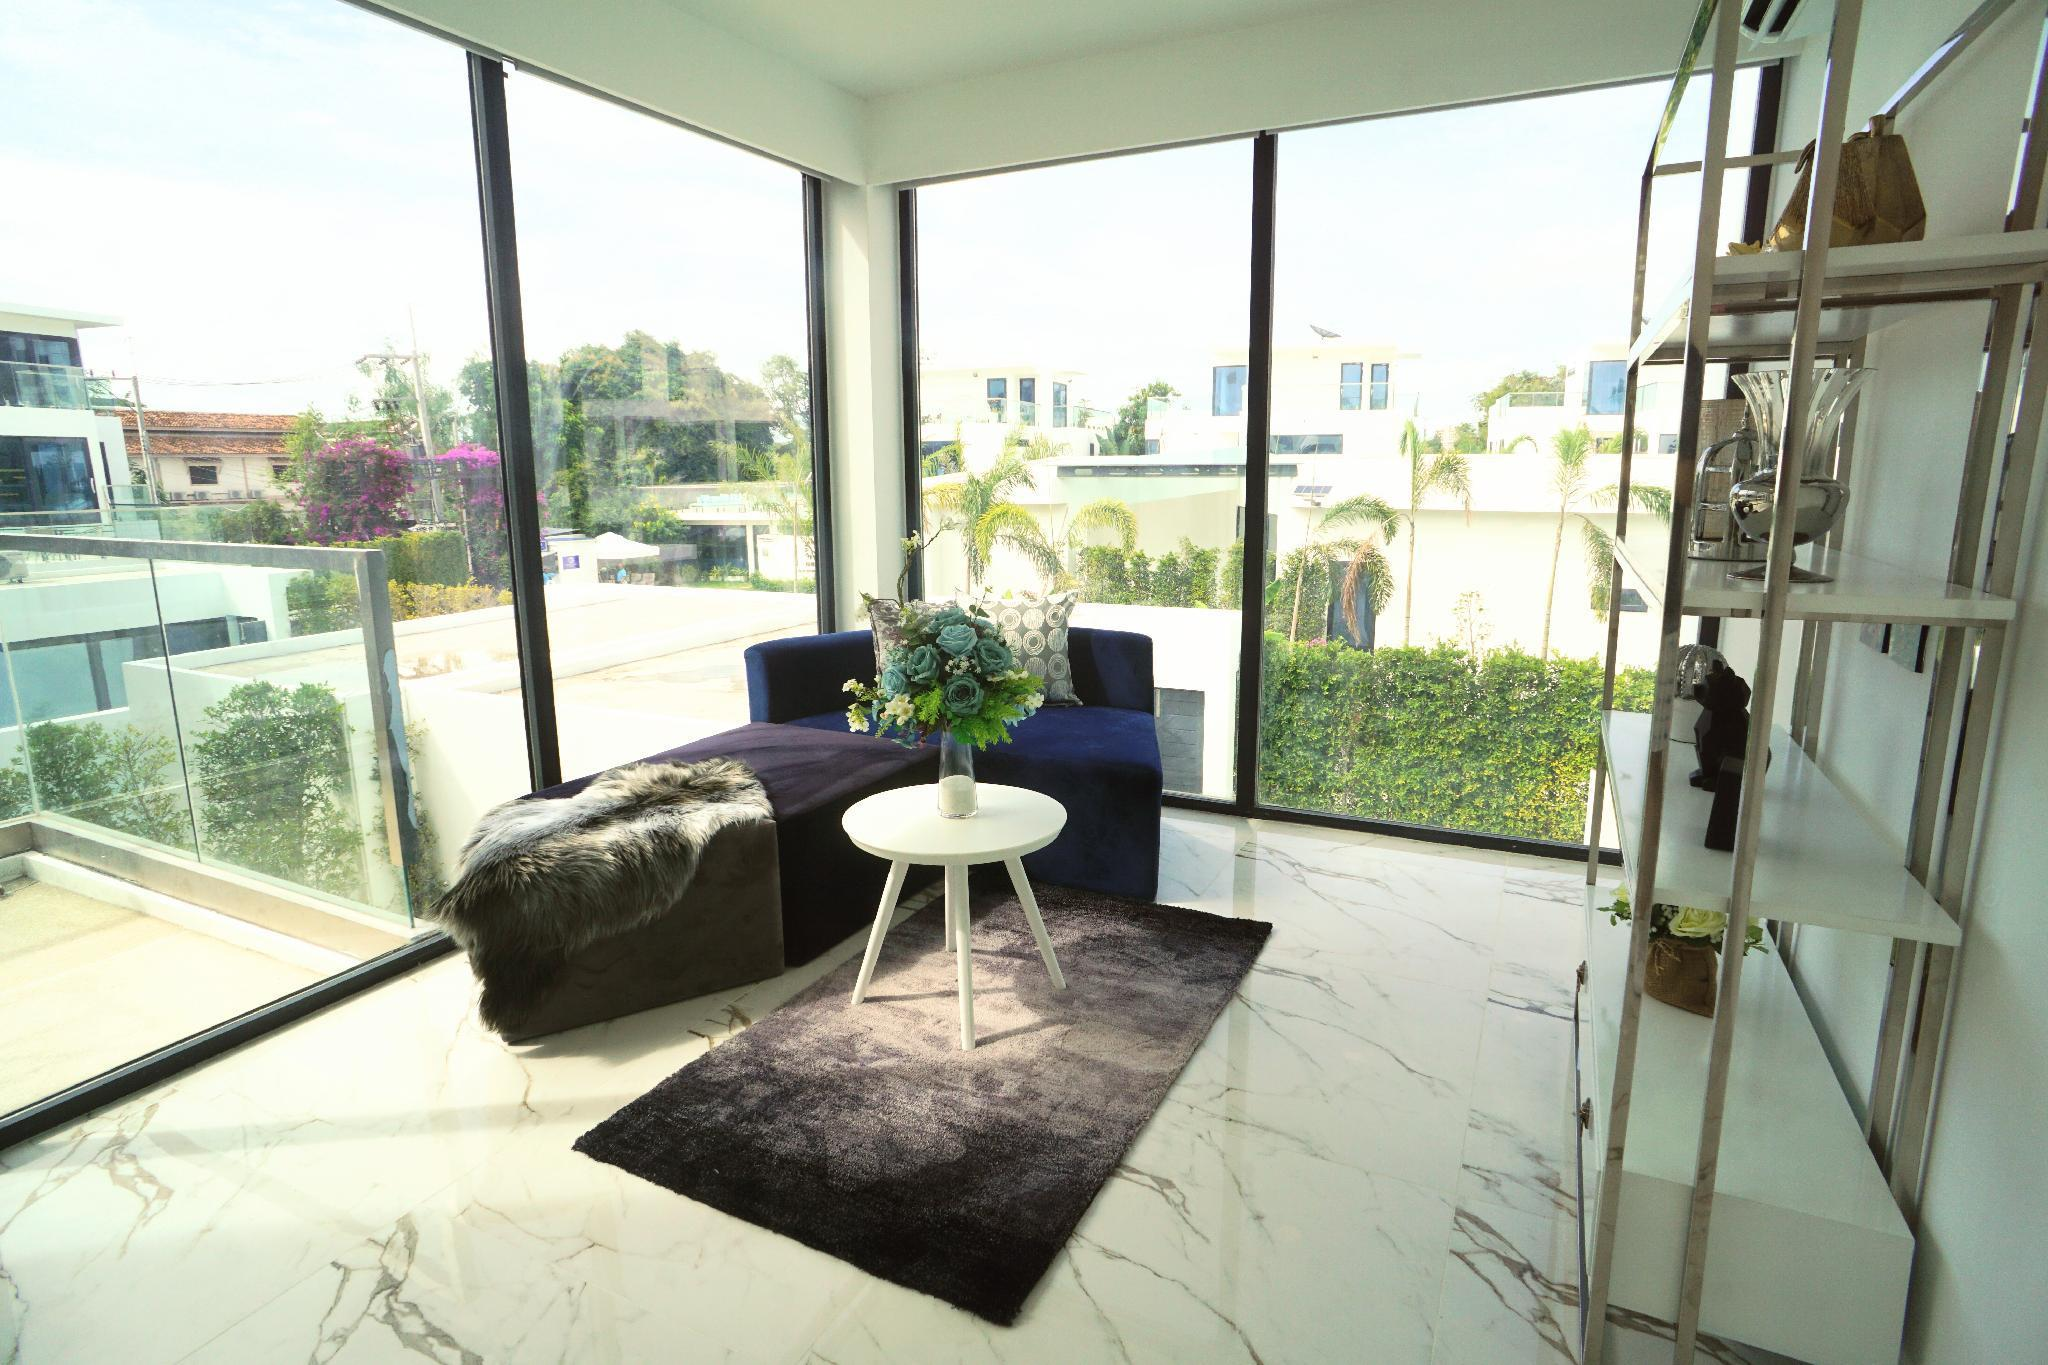 Palm spring villa 14 bedroom luxury pool villa วิลลา 14 ห้องนอน 14 ห้องน้ำส่วนตัว ขนาด 1400 ตร.ม. – เขาพระตำหนัก